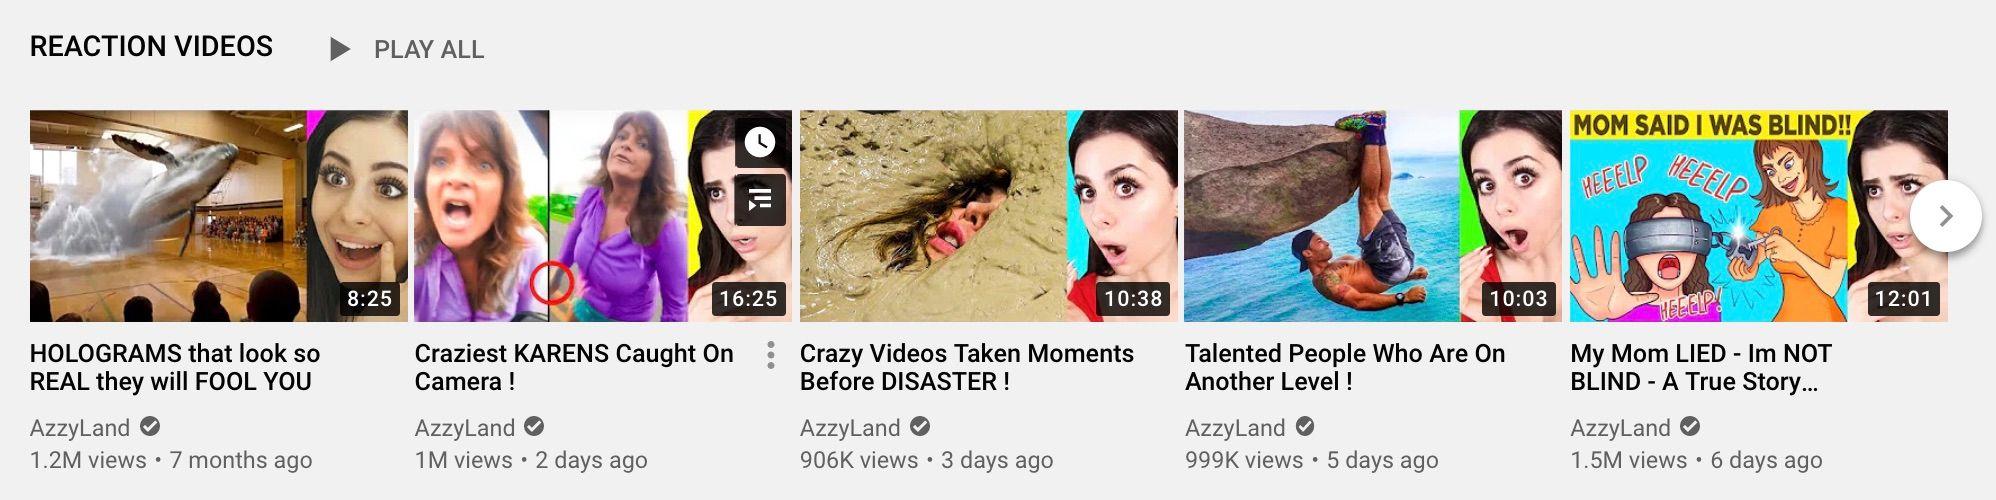 Azzyland - Reaction videos